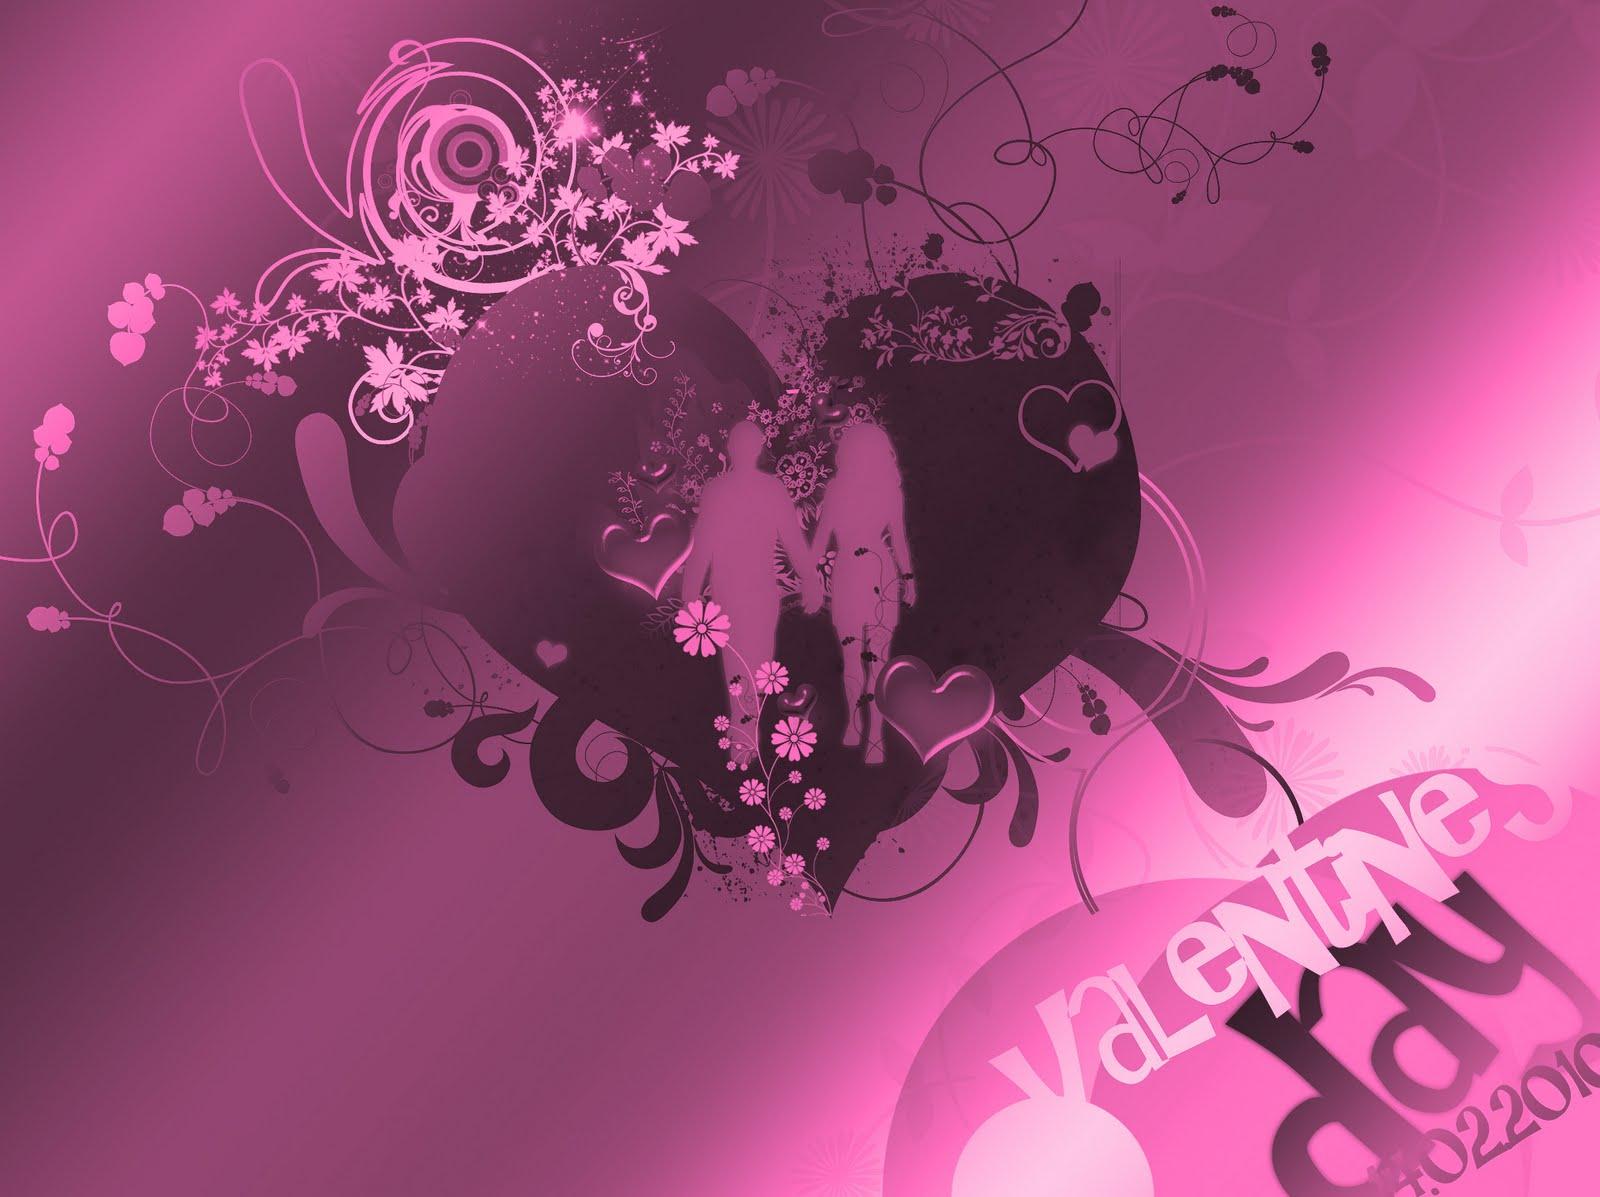 http://3.bp.blogspot.com/-rUoh9--oCj0/TscFREmh-sI/AAAAAAAAAm4/sWBAeH0zIq0/s1600/valentines-day-hd-3-760285.jpg